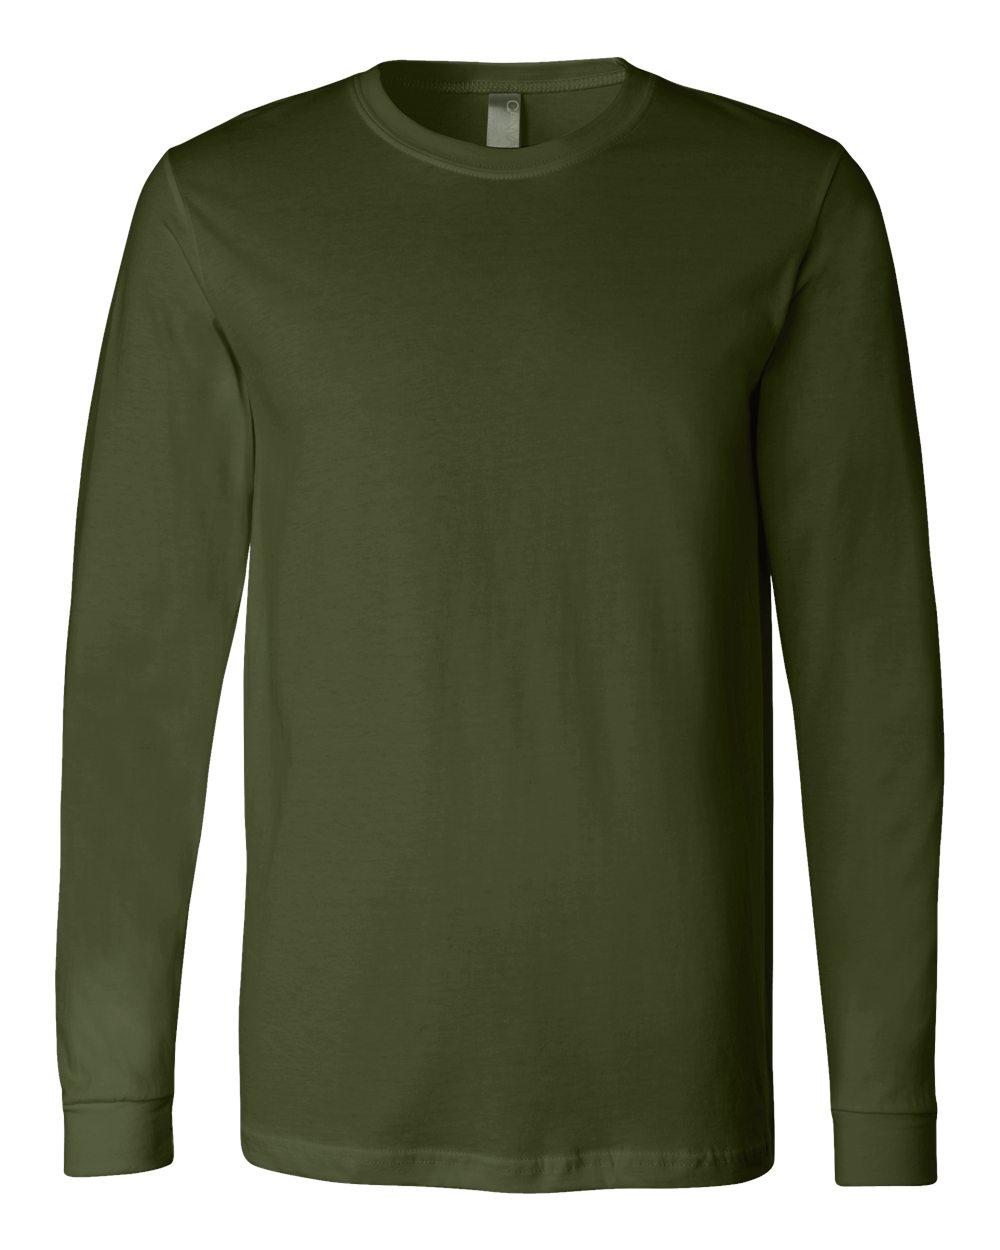 Bella-Canvas-Mens-Blank-Top-Long-Sleeve-Jersey-Tee-T-Shirt-3501-up-to-3XL thumbnail 94